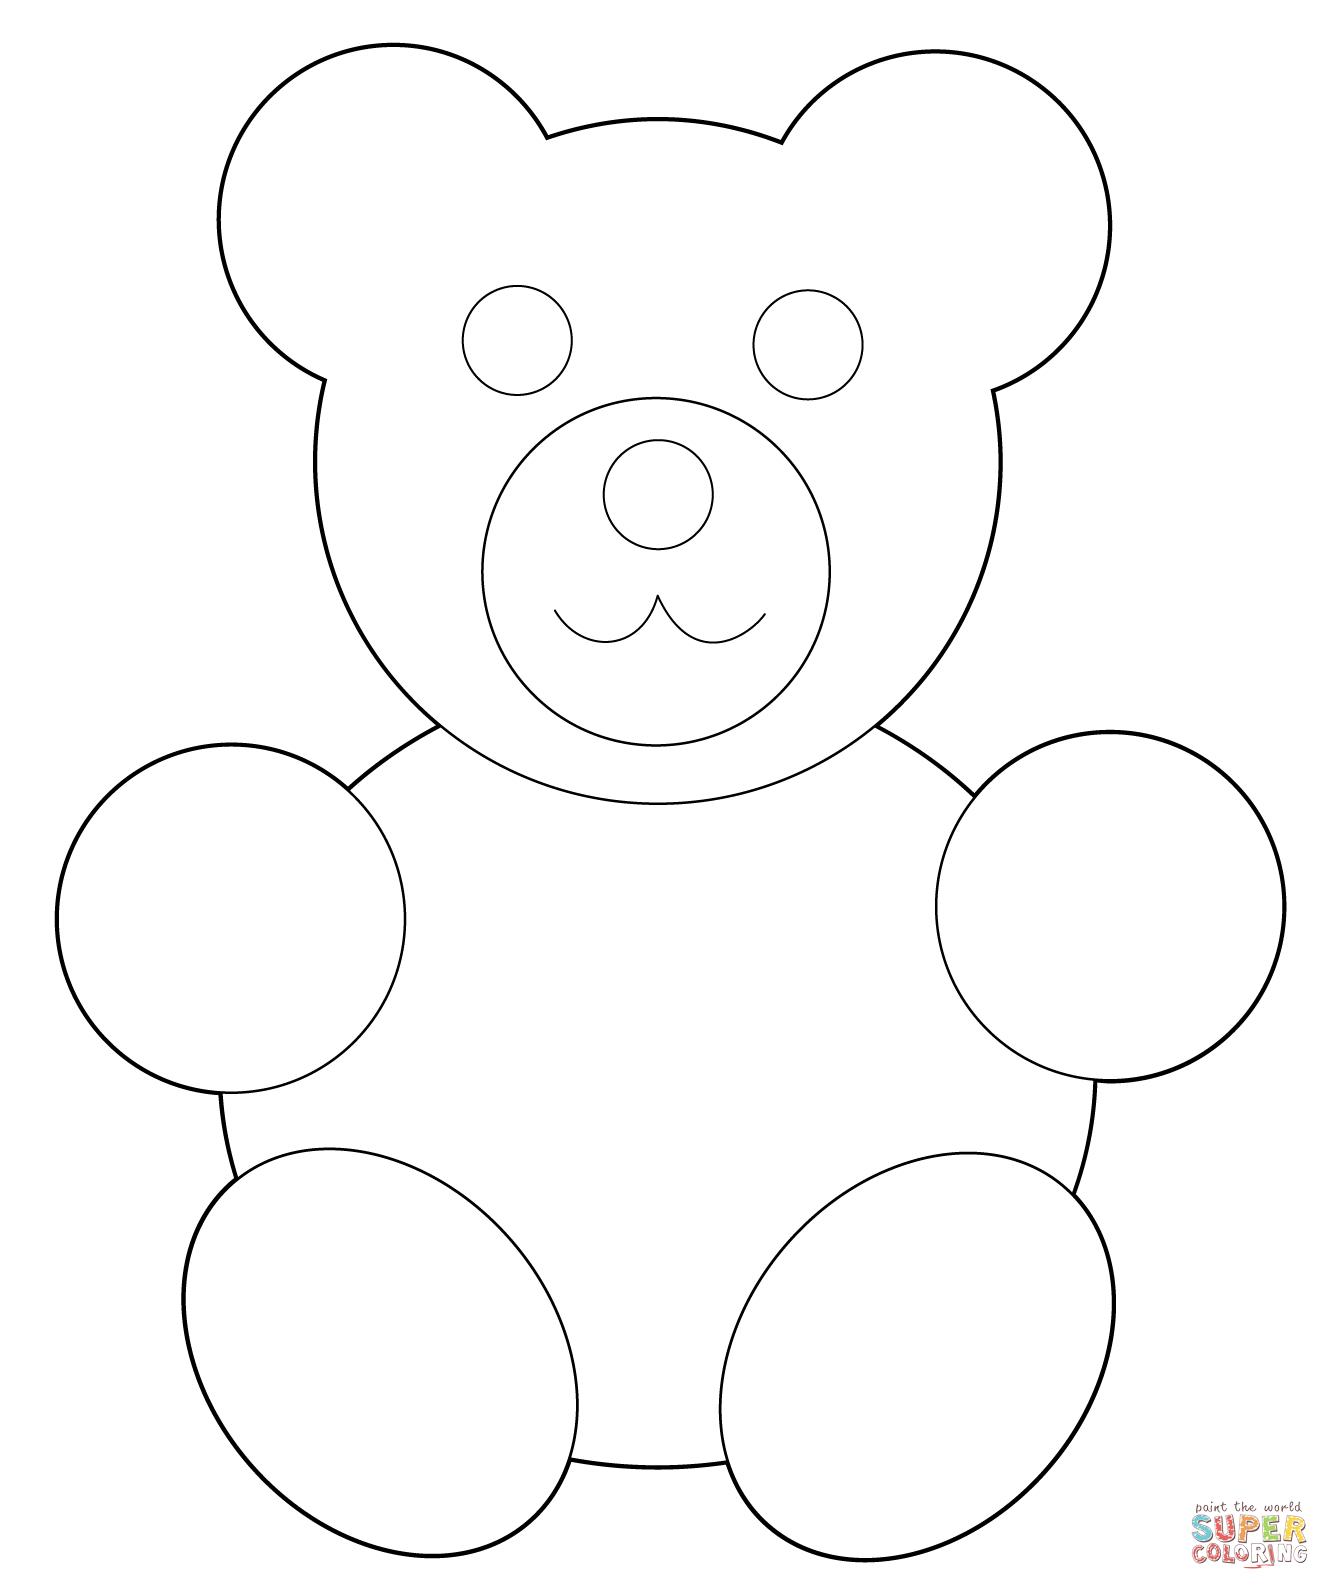 1330x1590 Simple Drawing Of A Teddy Bear